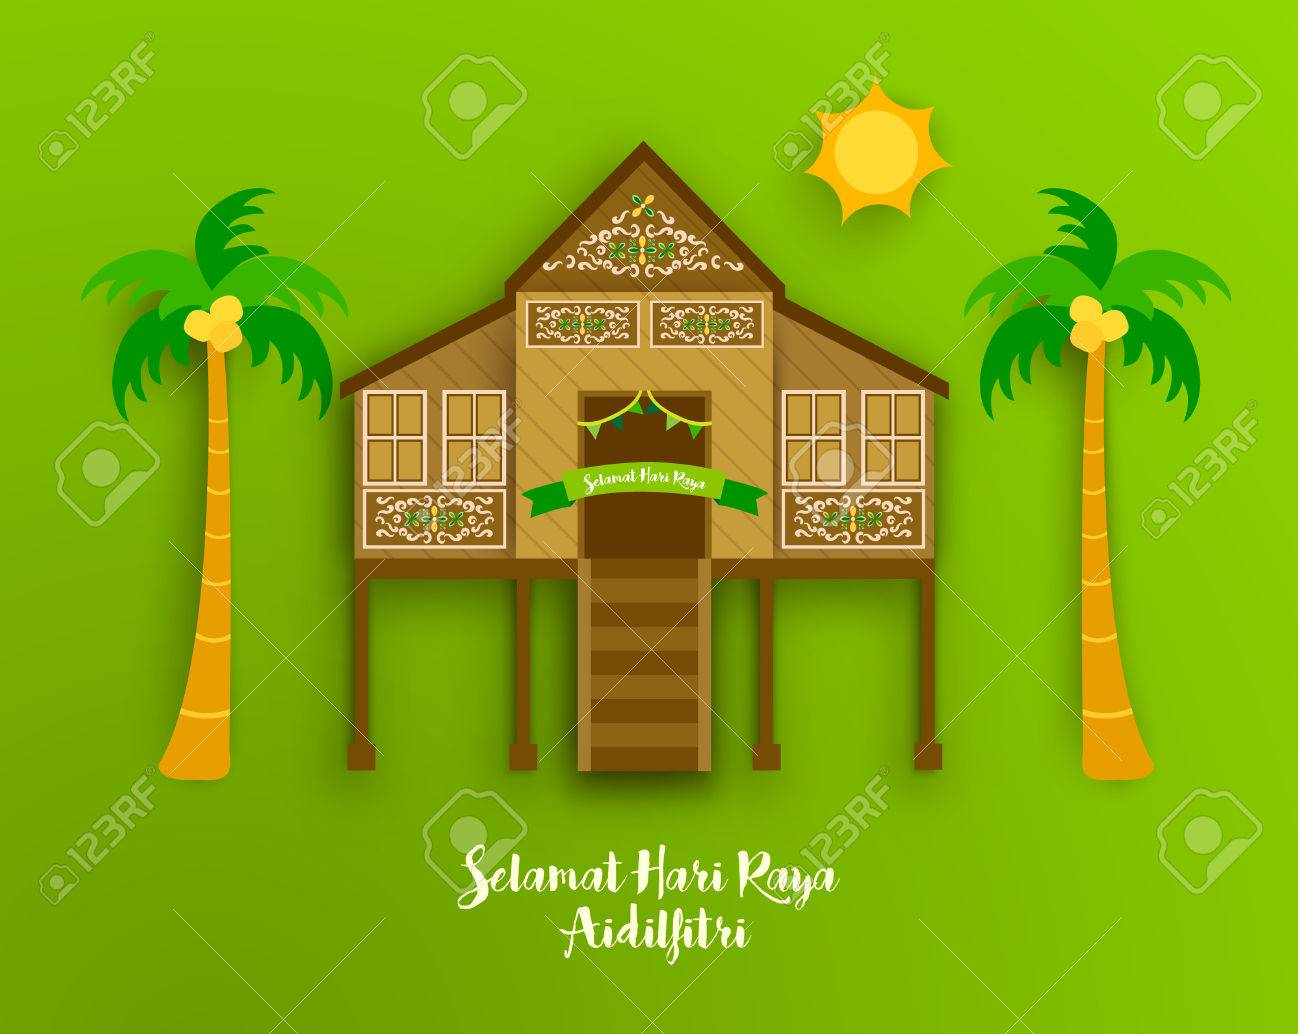 Eid Al Fitr Celebration greeting Vector Design Illustration - 62025181